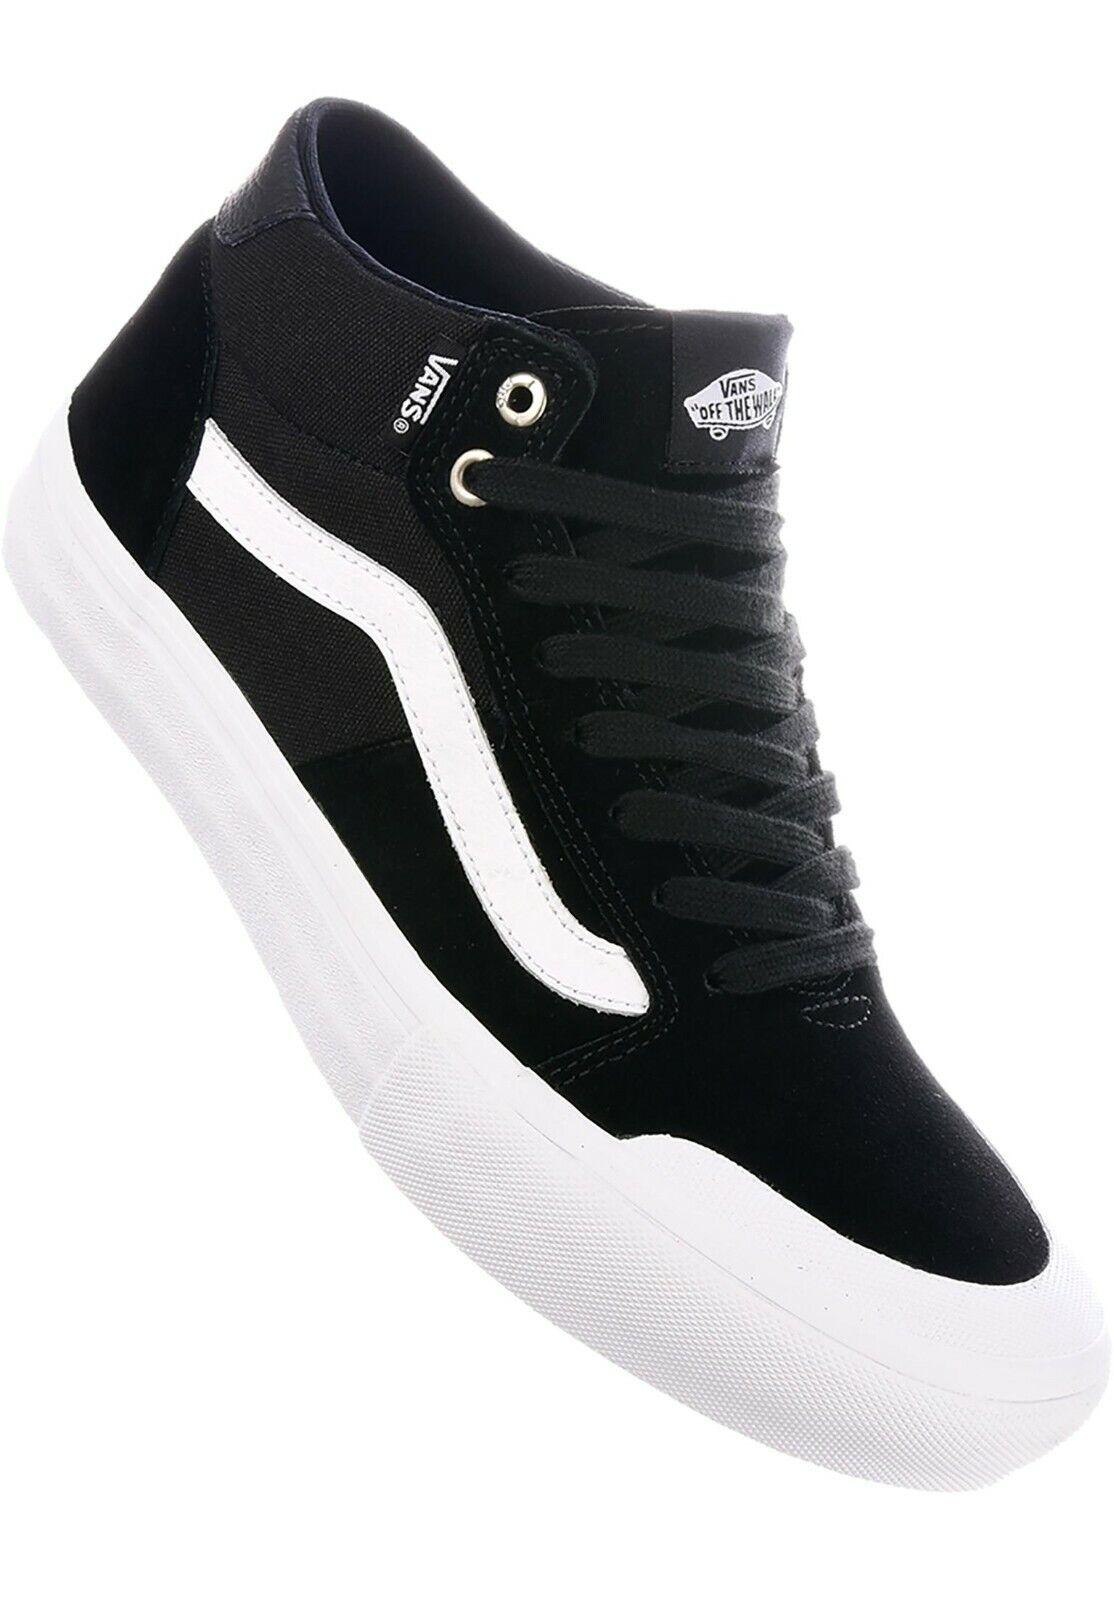 Vans Style 112 Mid Pro Black/White Men's Classic Skate Shoes